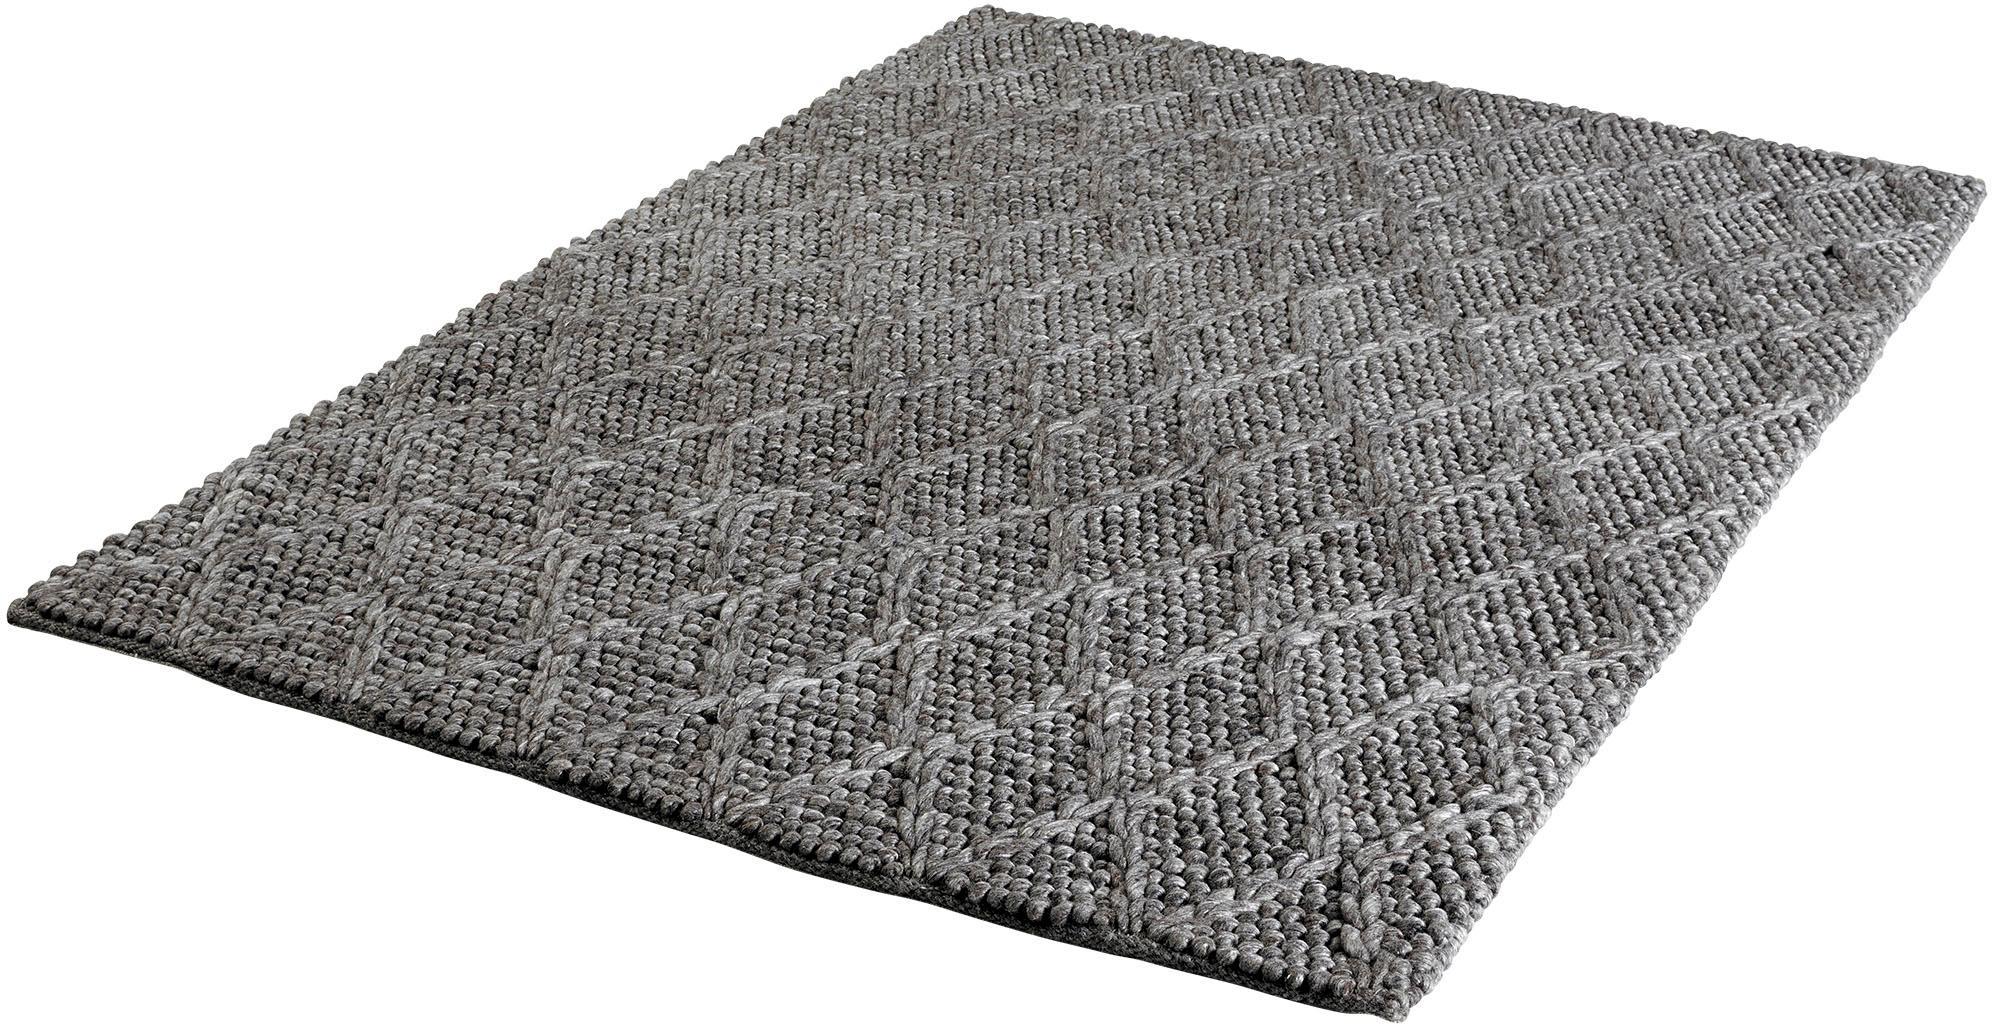 Teppich My Studio 620 Obsession rechteckig Höhe 23 mm